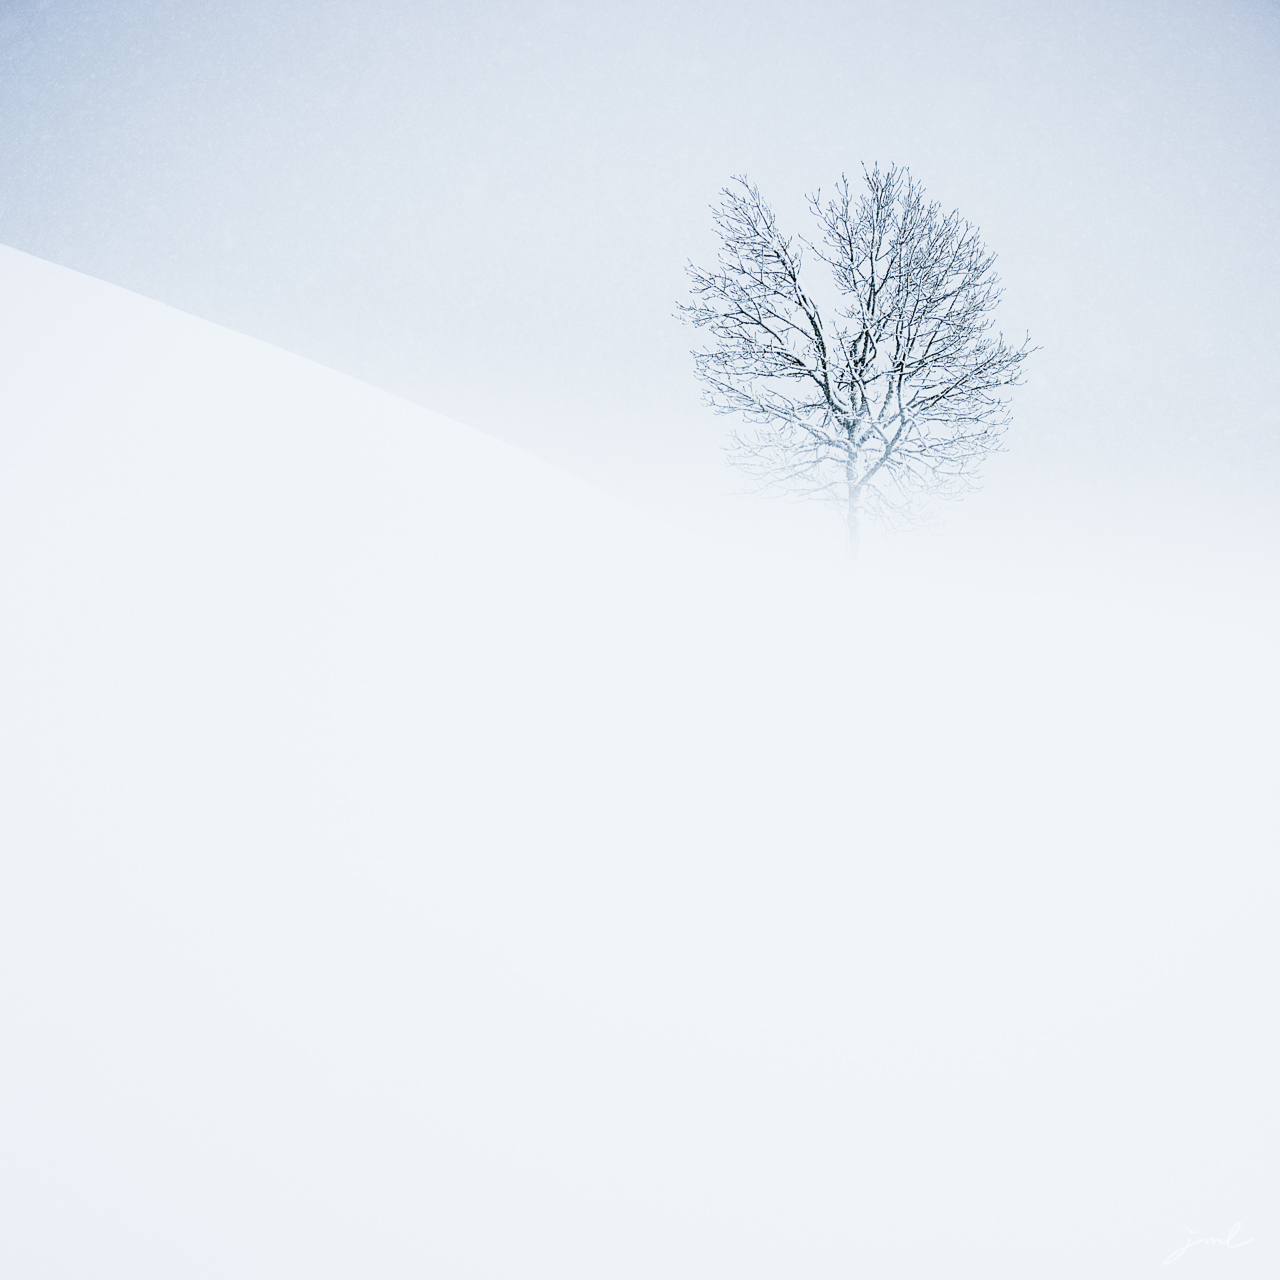 Songe hivernal